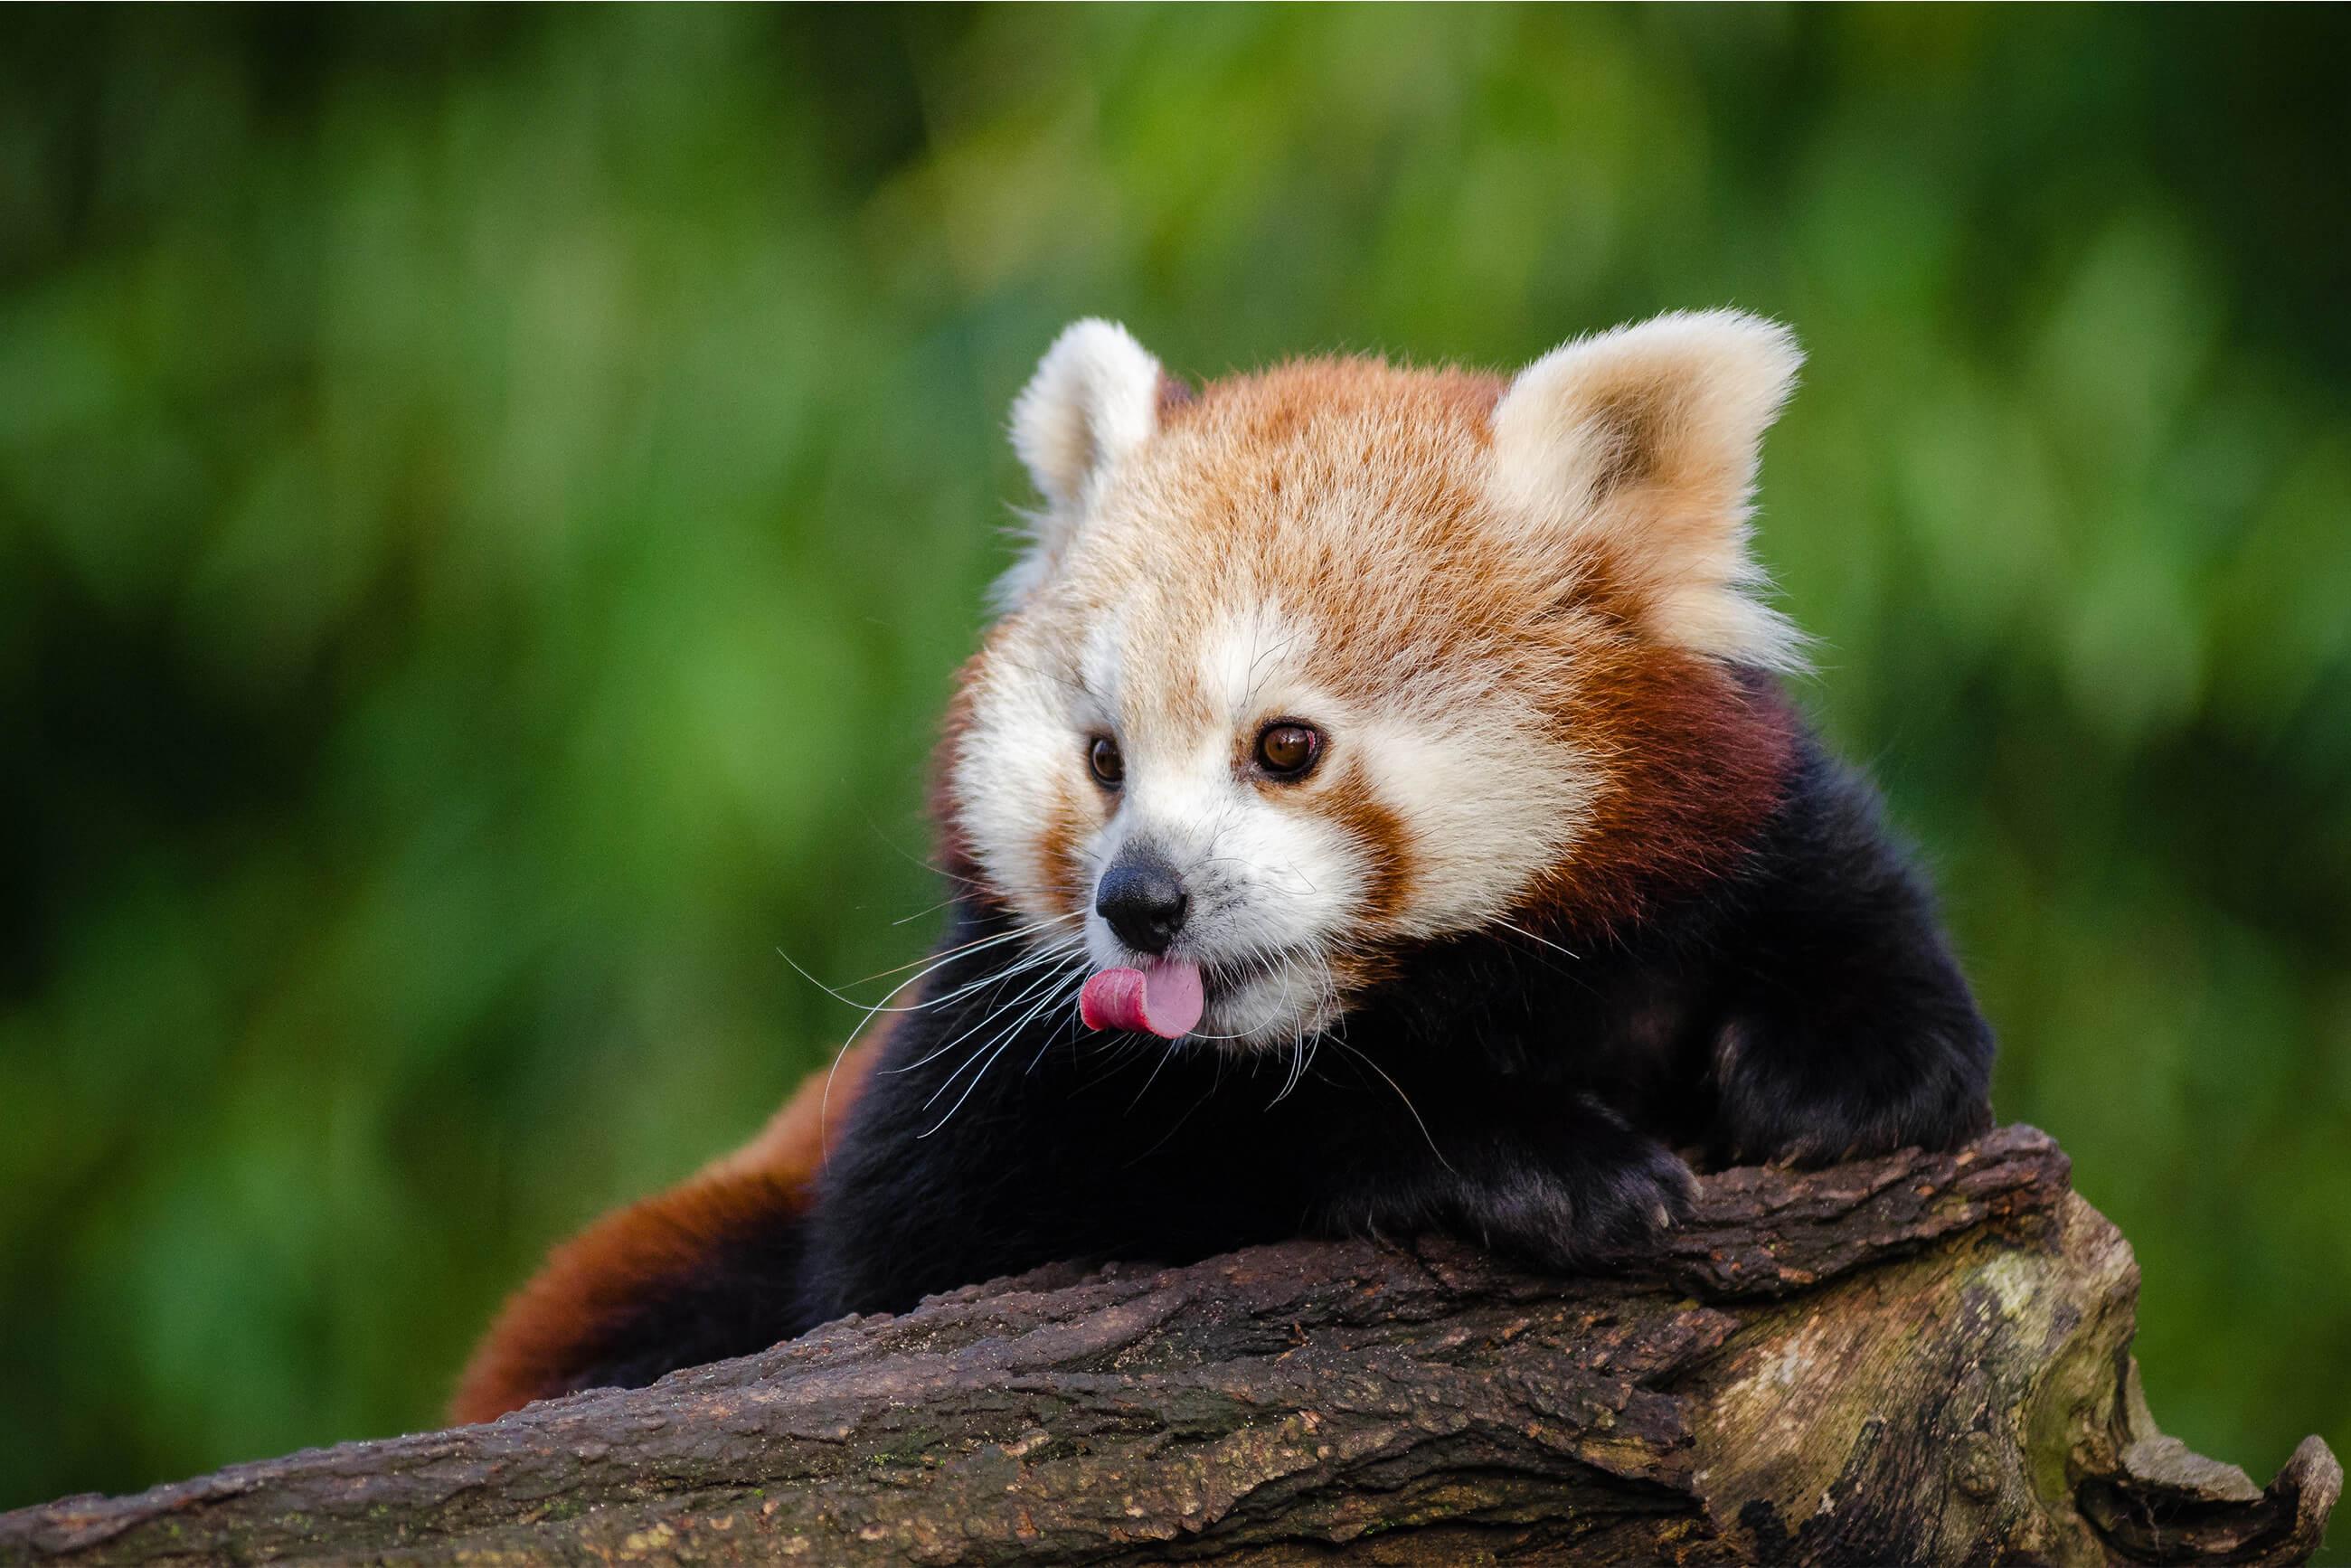 https://bubo.sk/uploads/galleries/4914/cervena-panda.jpg